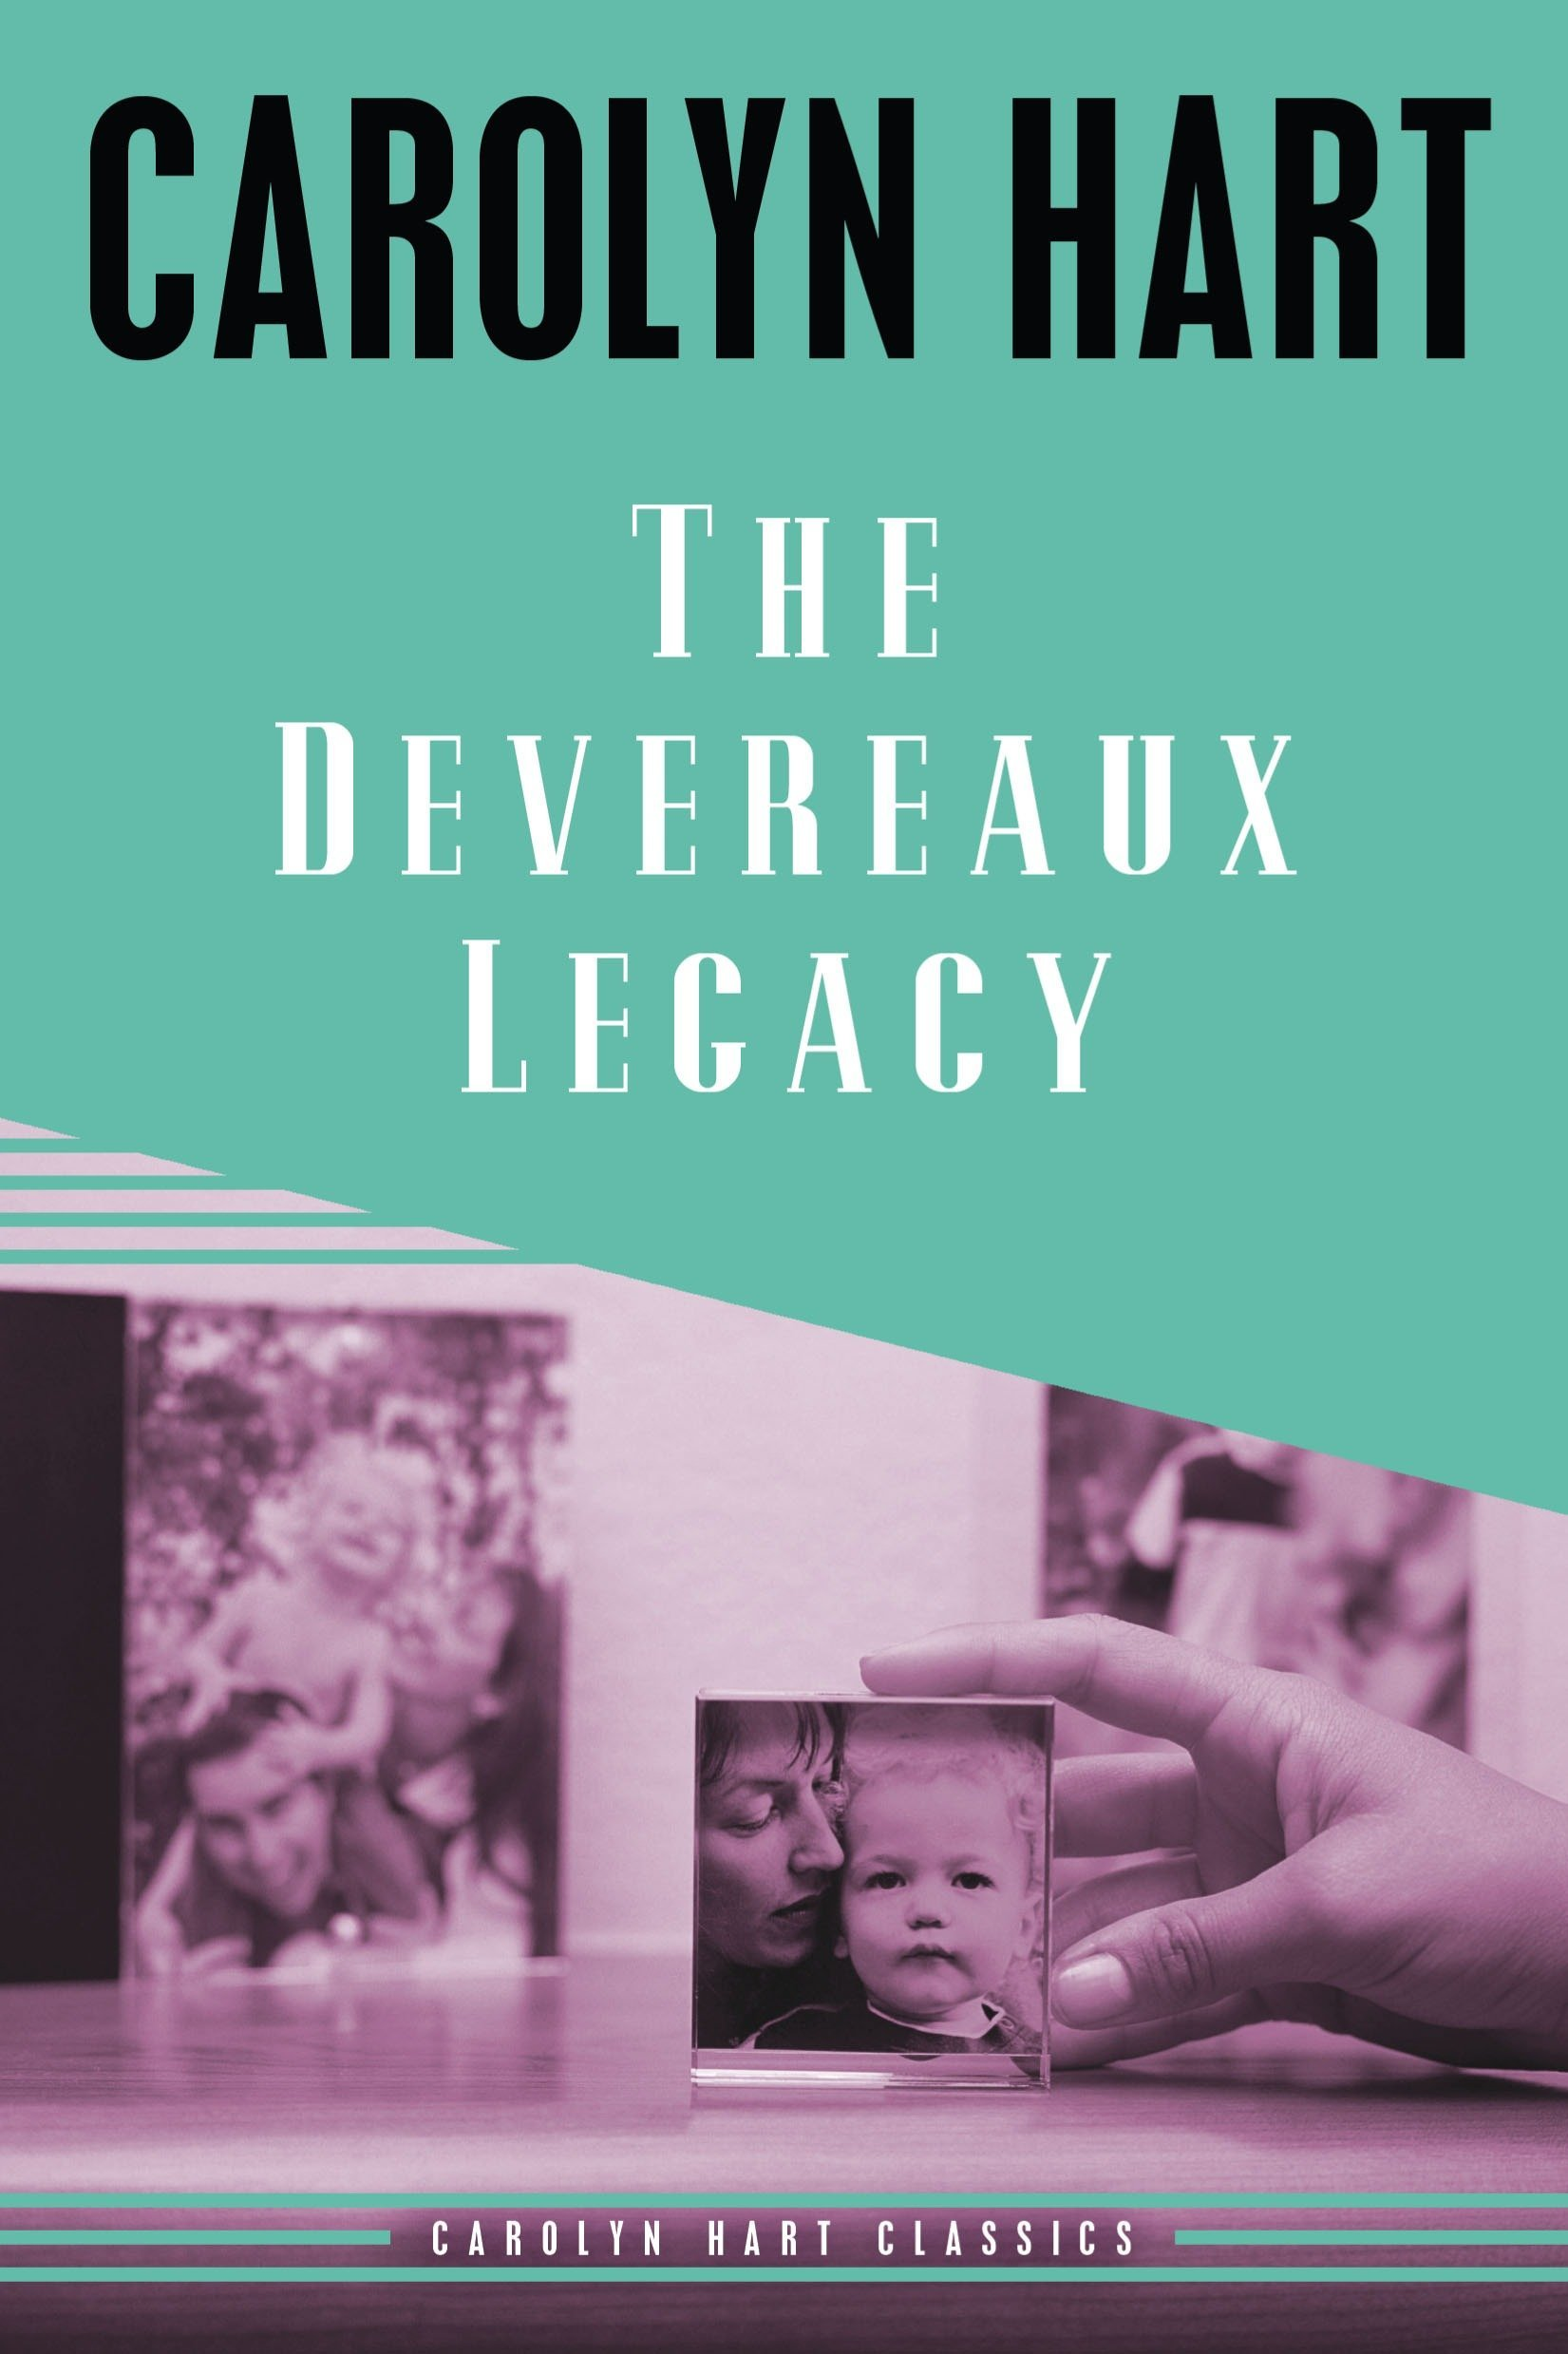 Download The Devereaux Legacy (Carolyn Hart Classics) ebook